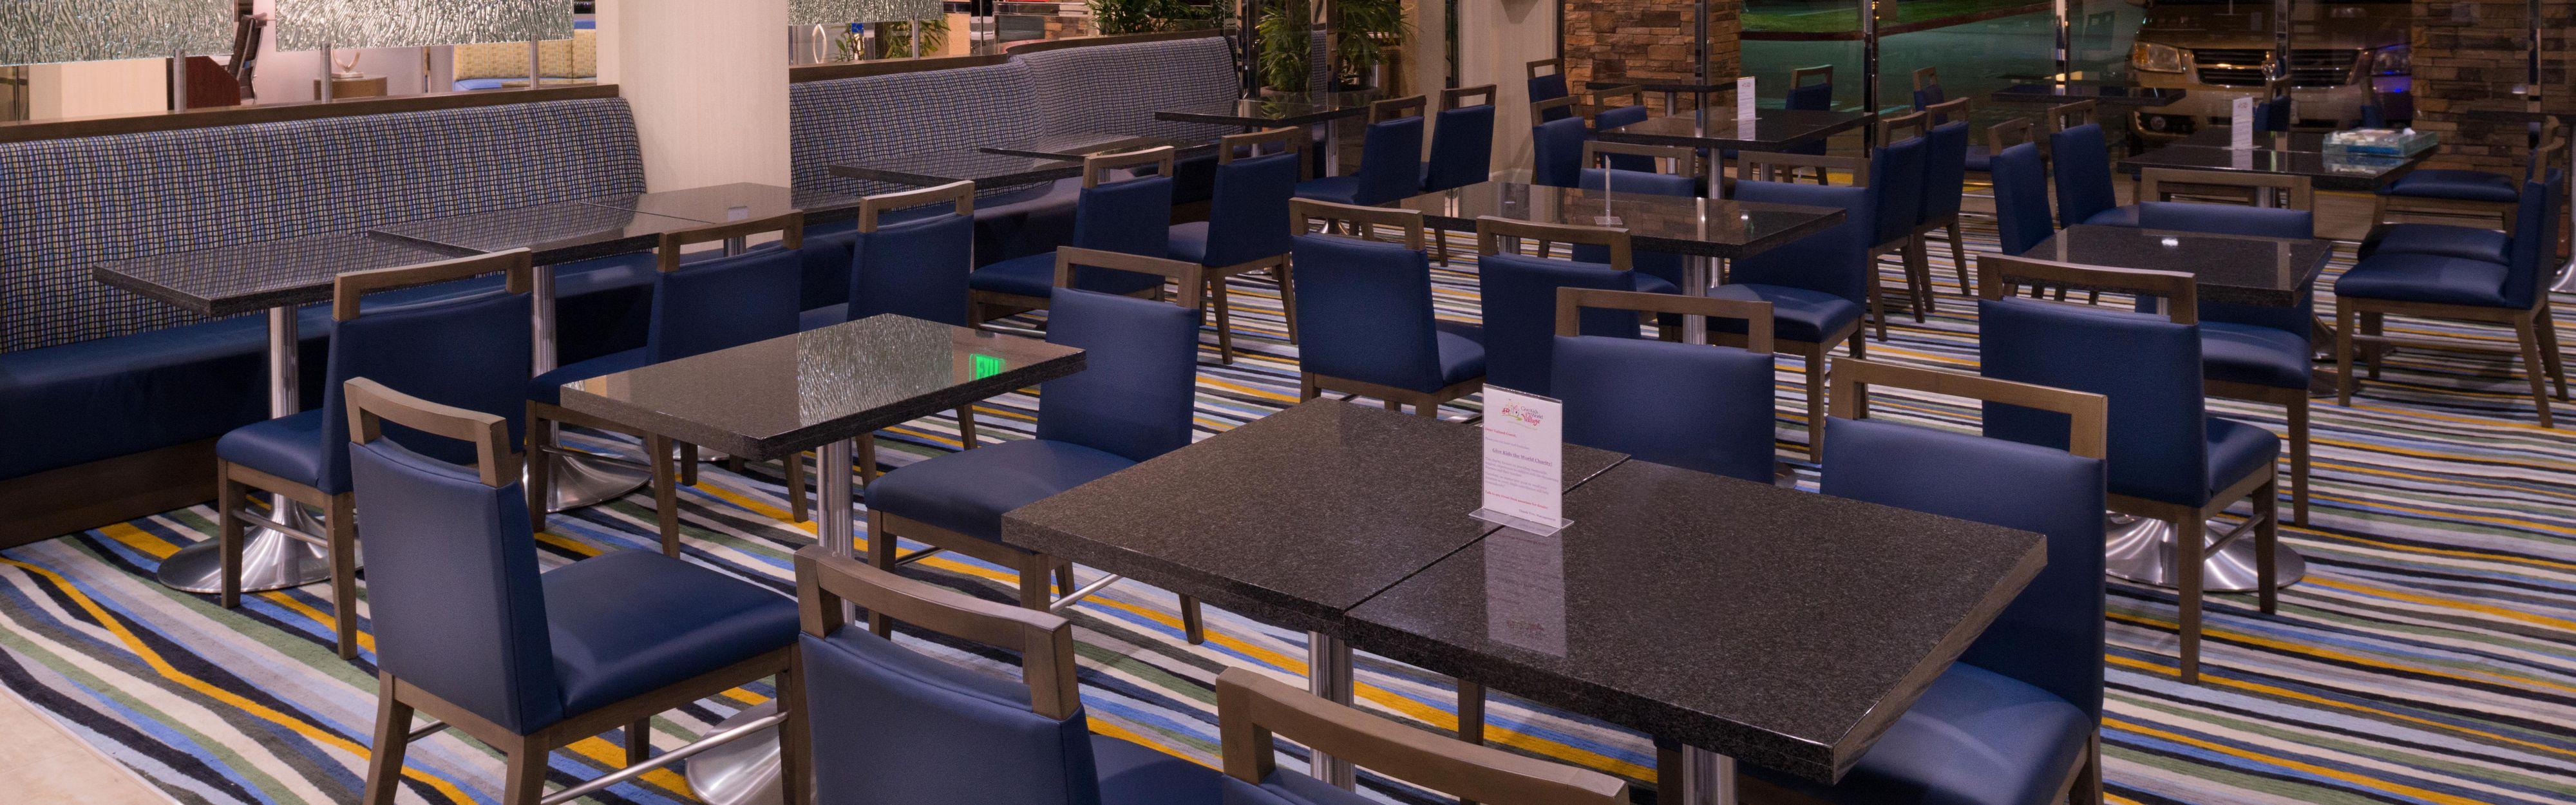 Holiday Inn Express Pasadena-Colorado Blvd. image 3